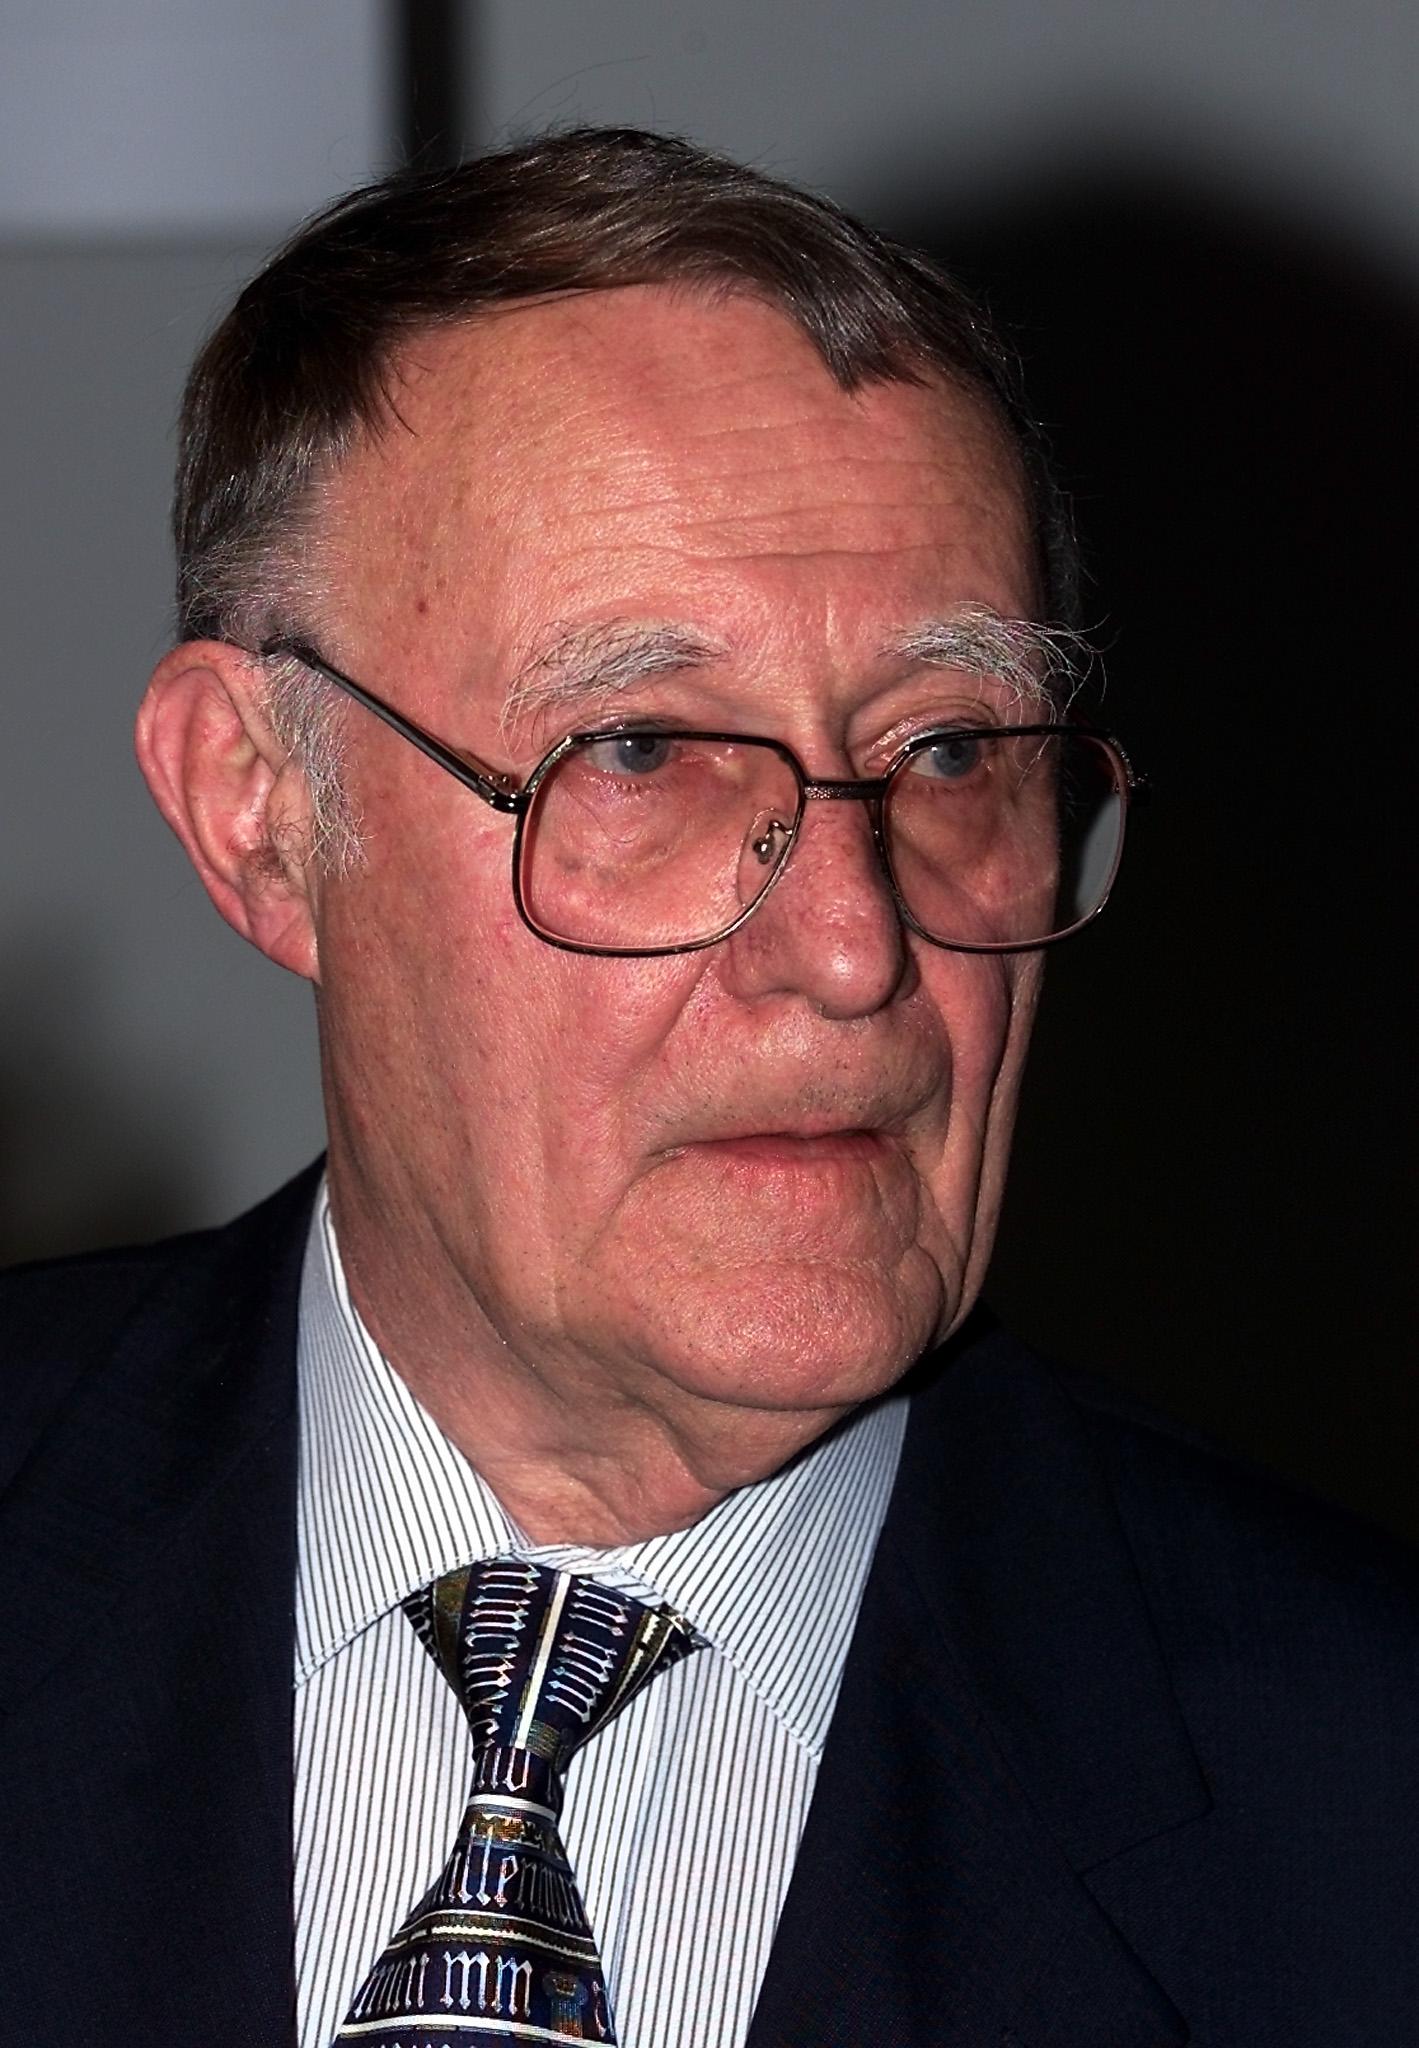 Ingvar Kamprad, the chairman of Ikea, answers the